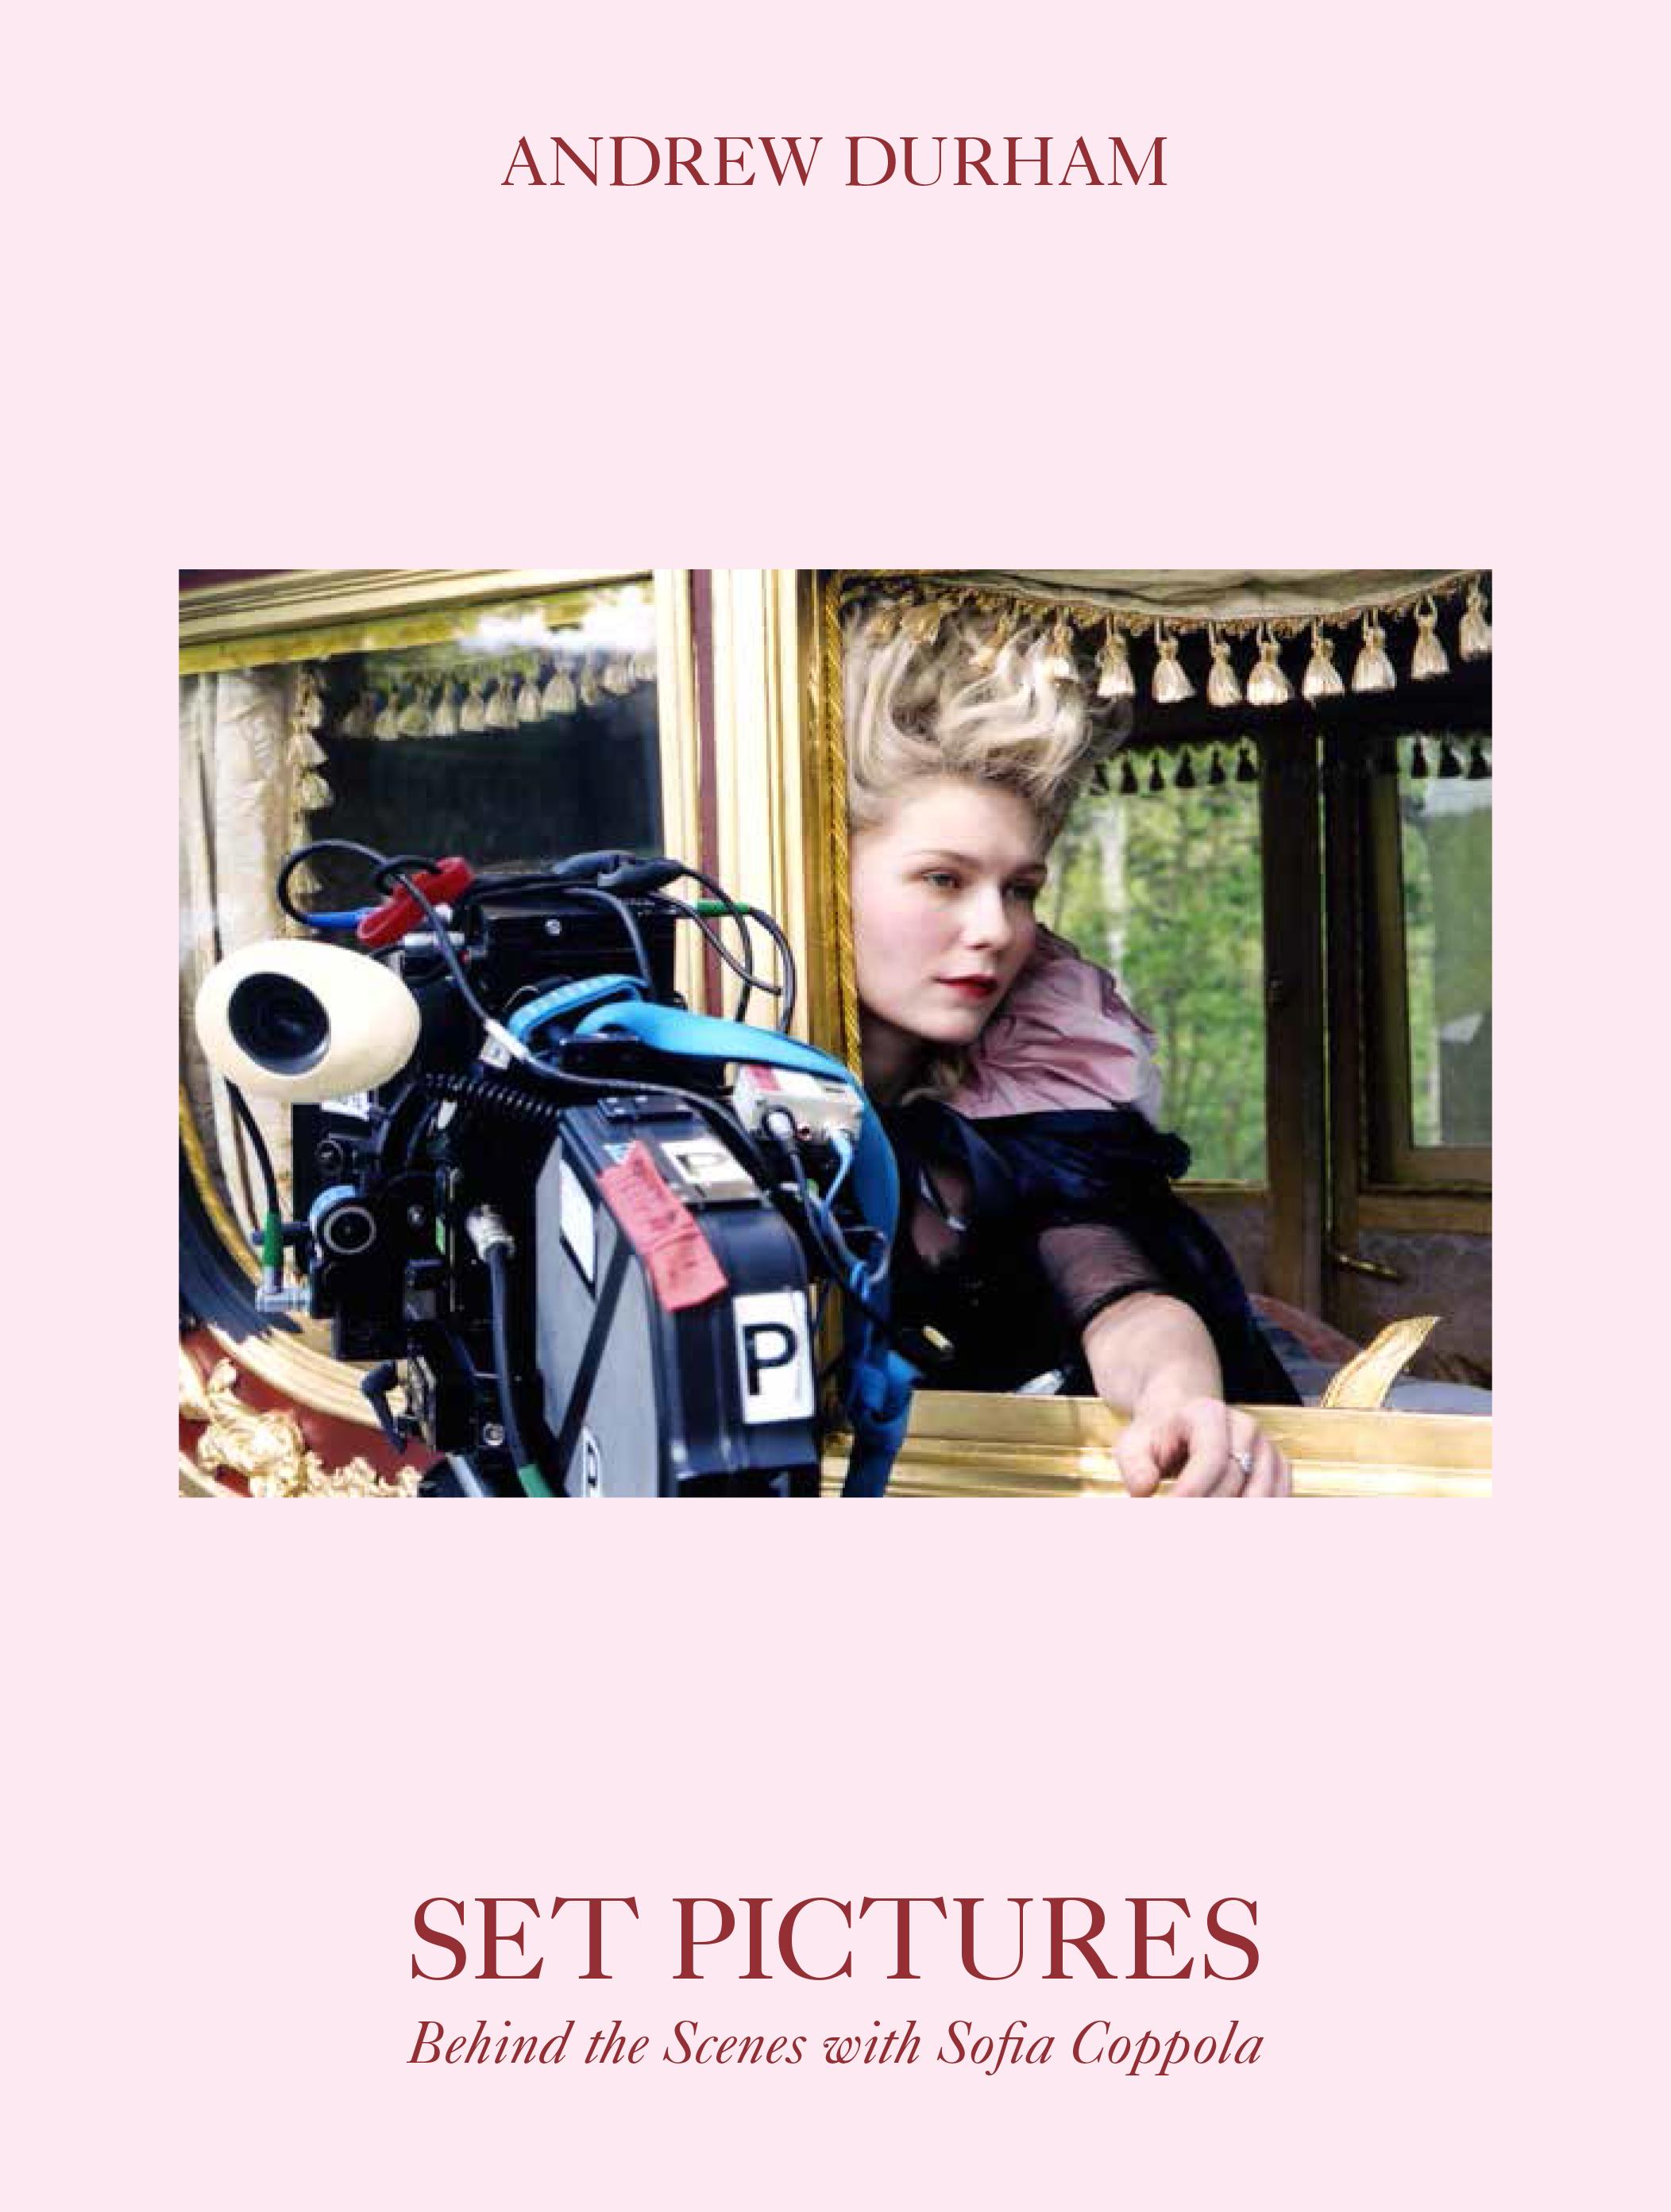 Andrew Durham SET PICTURES Behind the Scenes with Sofia Coppola ソフィア・コッポラ監督20 周年記念メモリアル・フォトブック